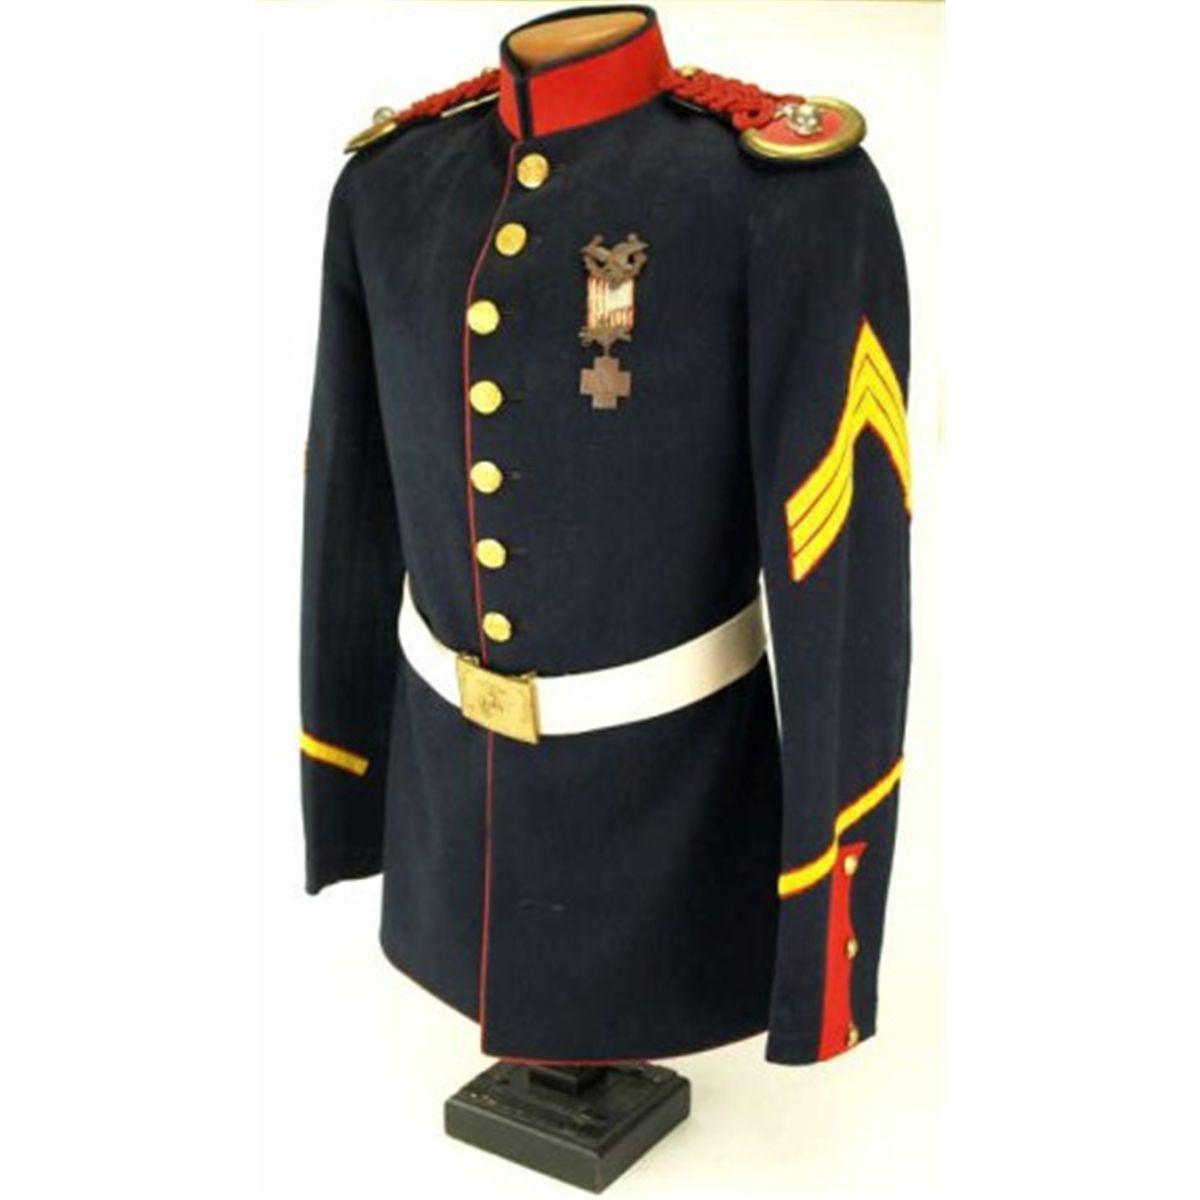 Marine Corps Dress Blue Bravos Regulations Best Gowns